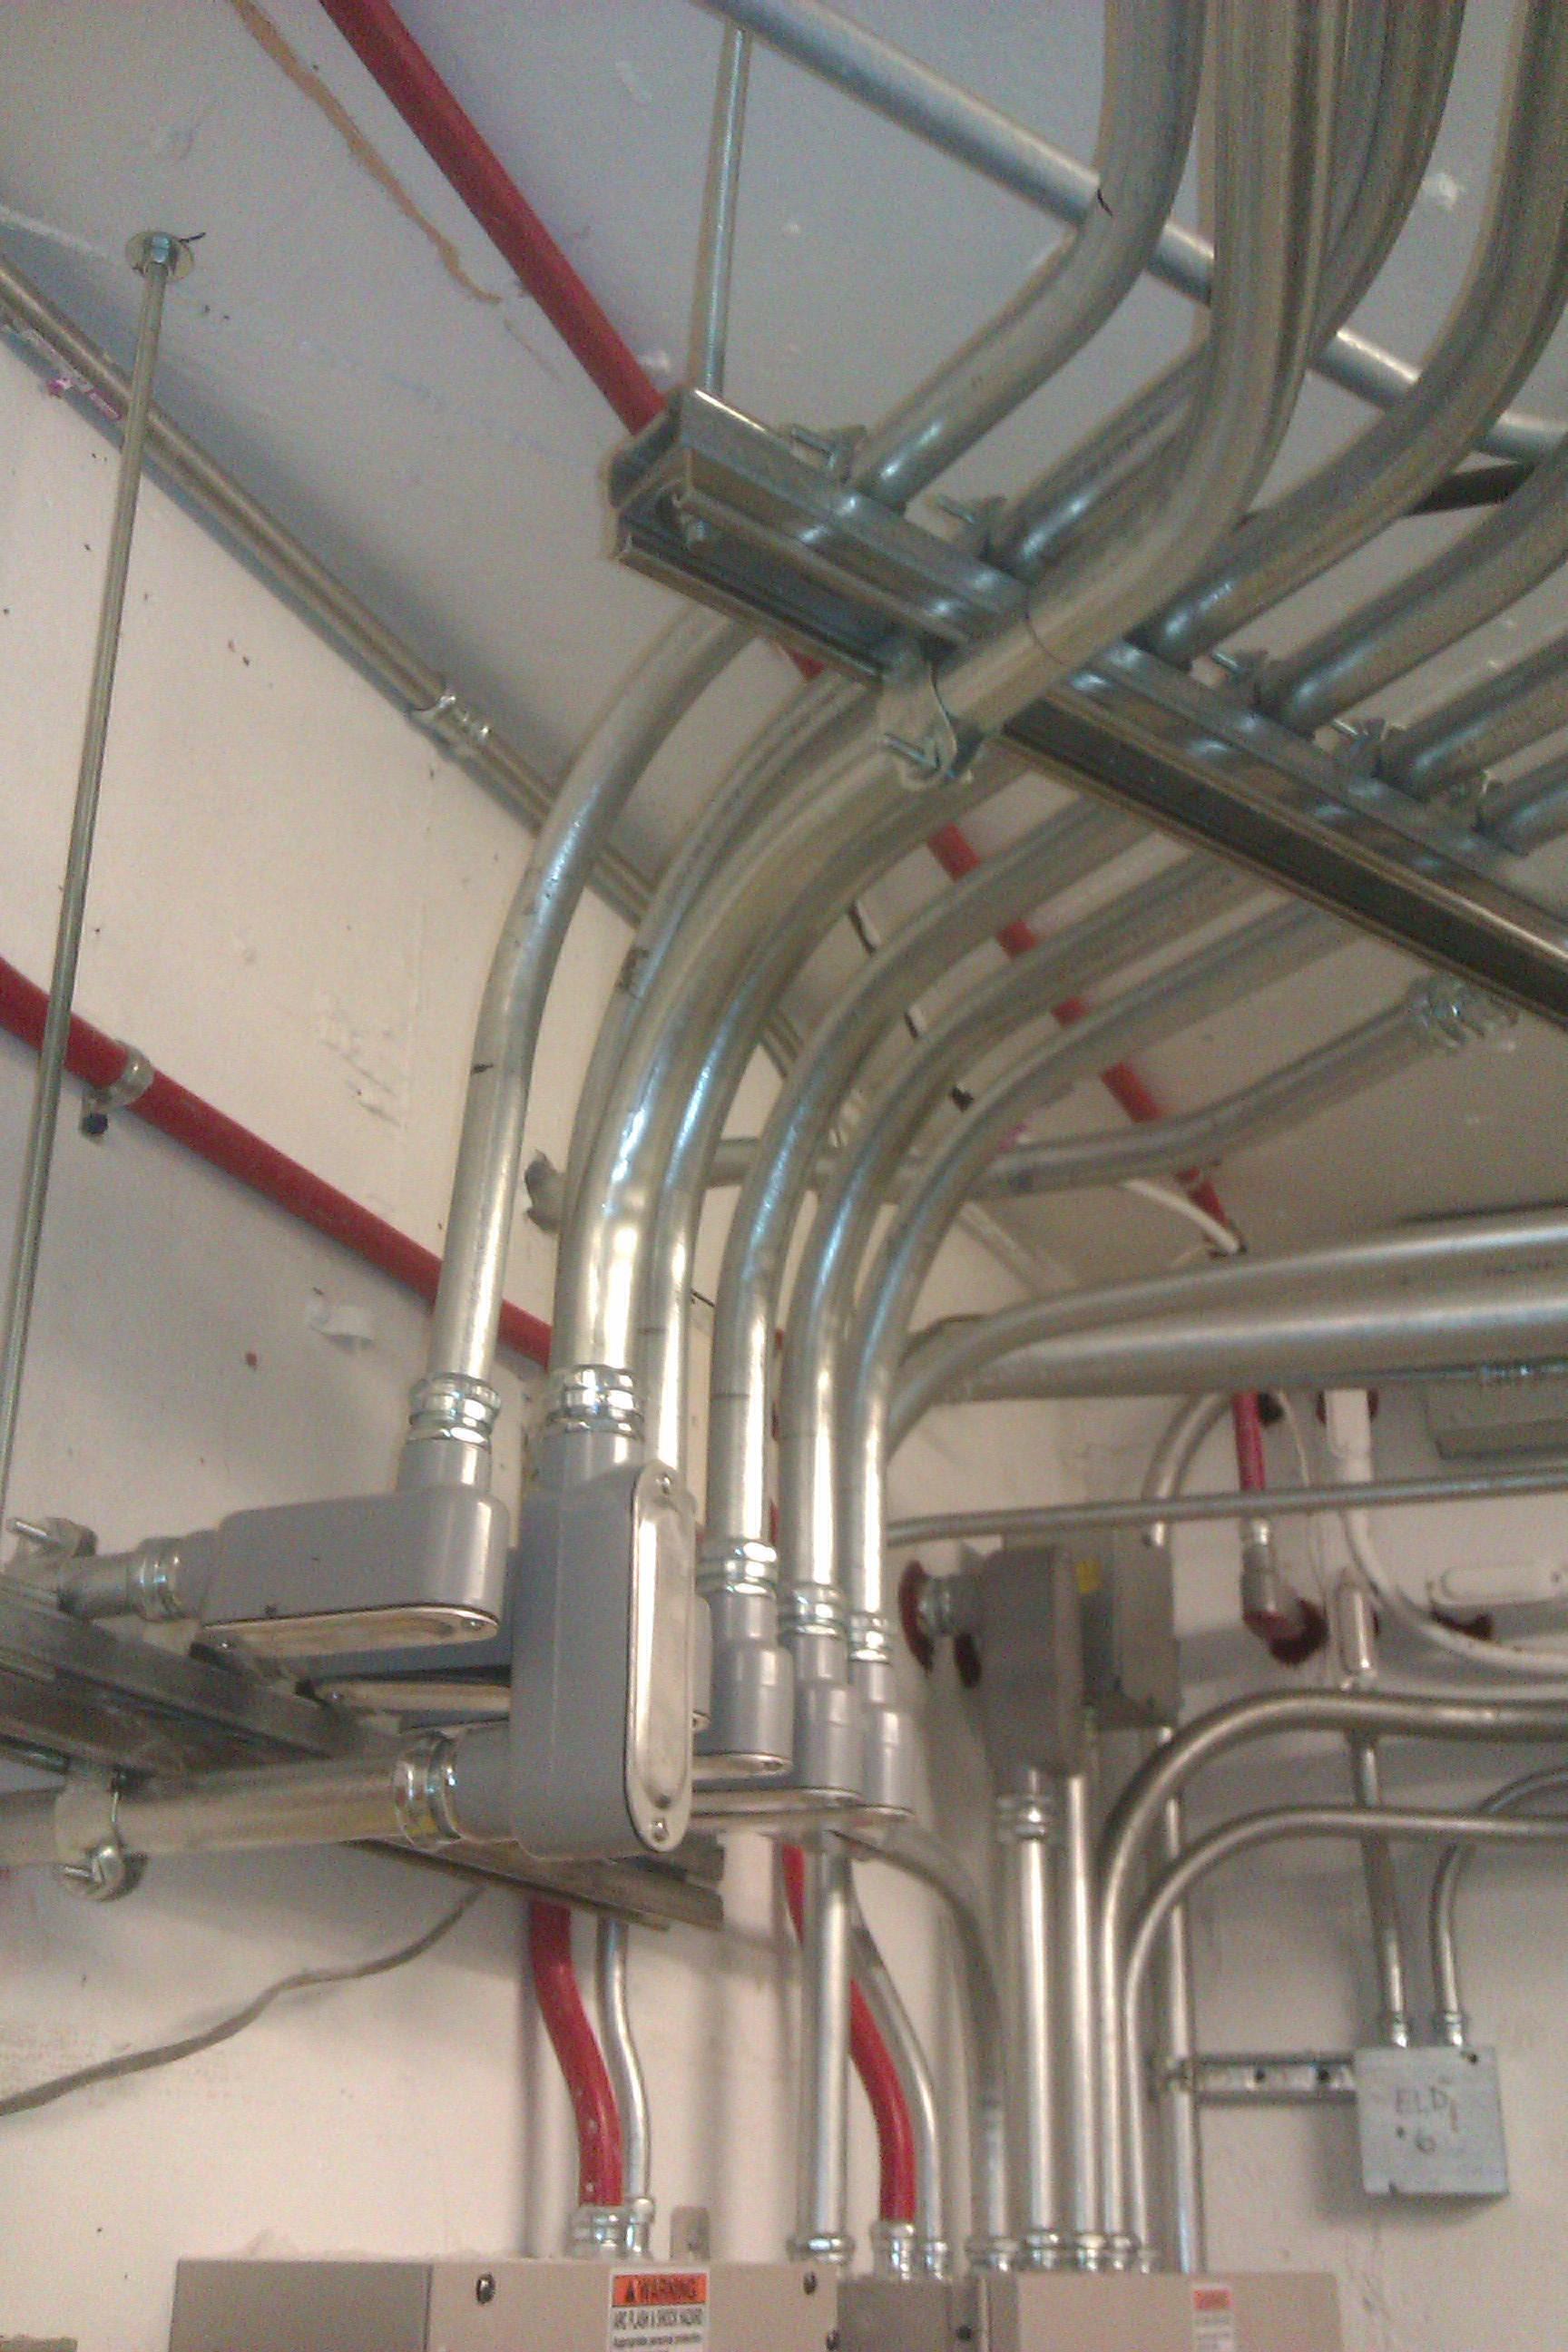 The art of bending conduit